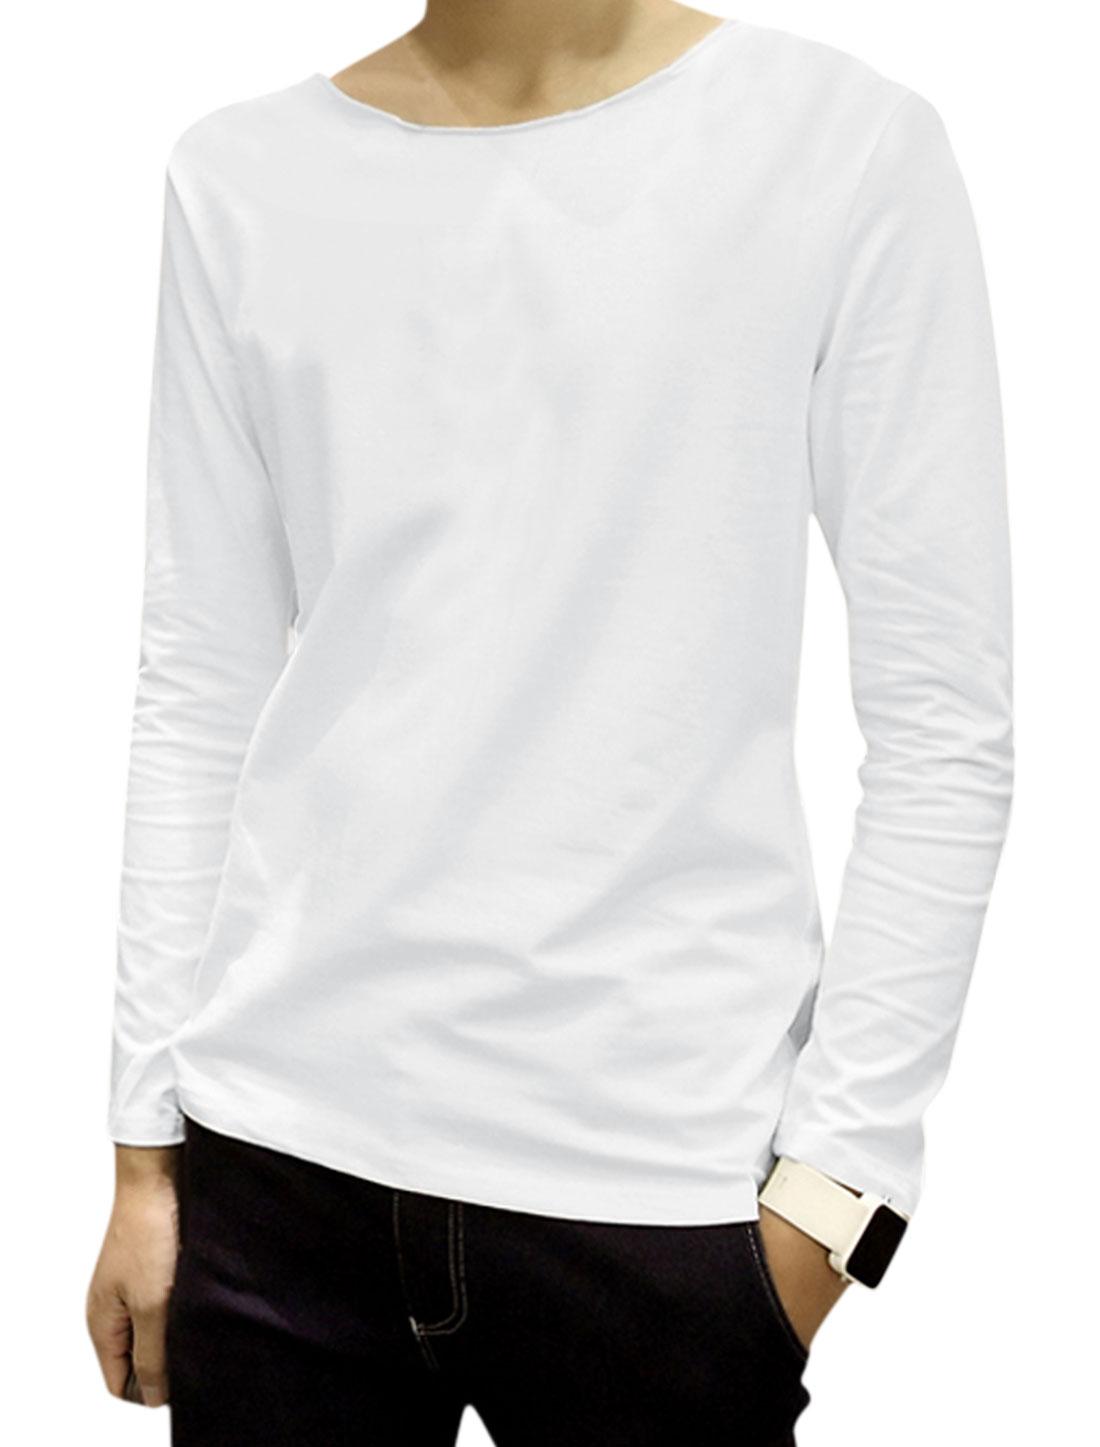 Man Long Sleeves Round Neck Raw Edge Tee Shirt White M